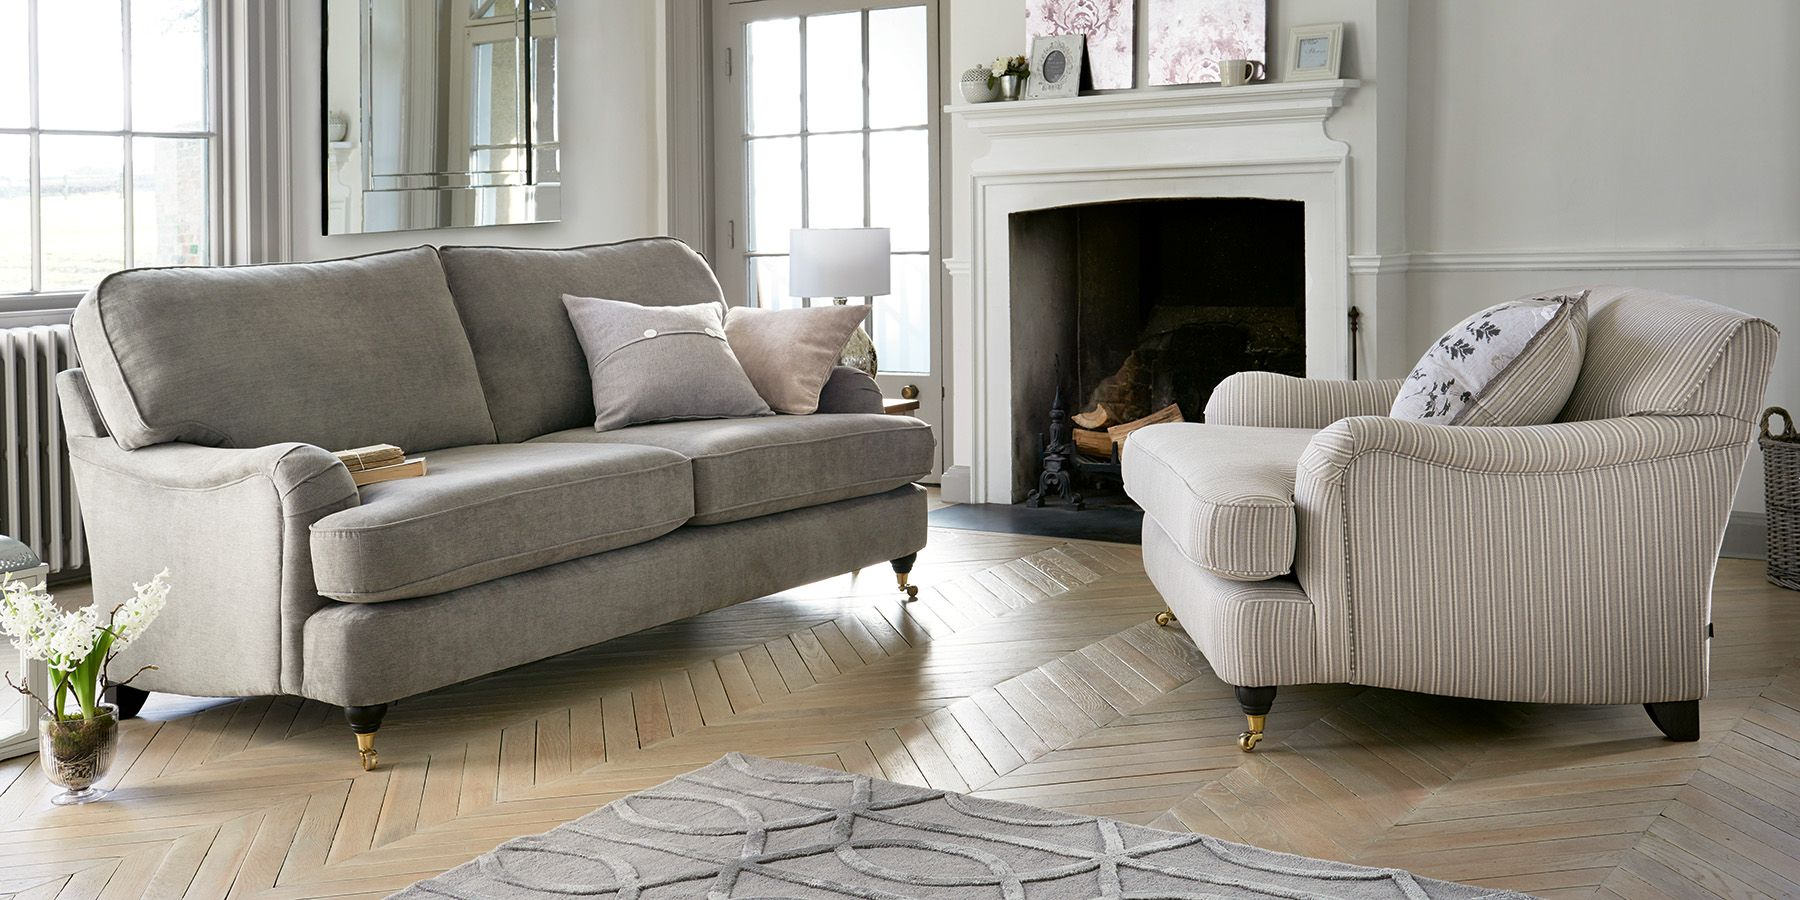 Buy Ophelia Formal Back Large Sofa (3 Seats) Boucle Weave